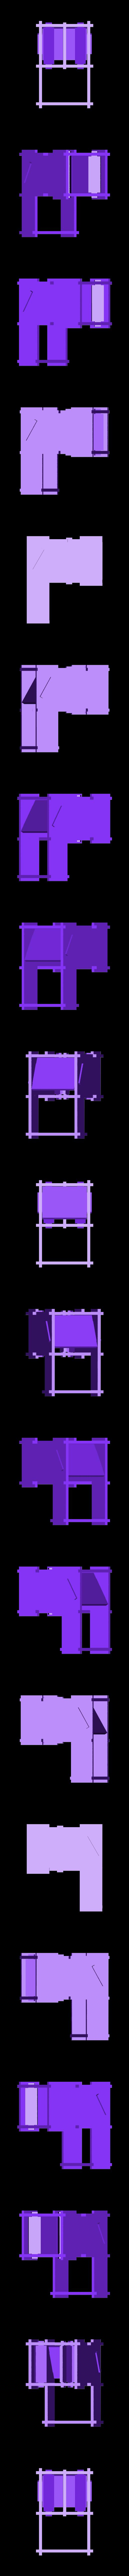 Mini-Dice-Tower.stl Download free STL file Mini Dice Tower • 3D printable model, Tramgonce